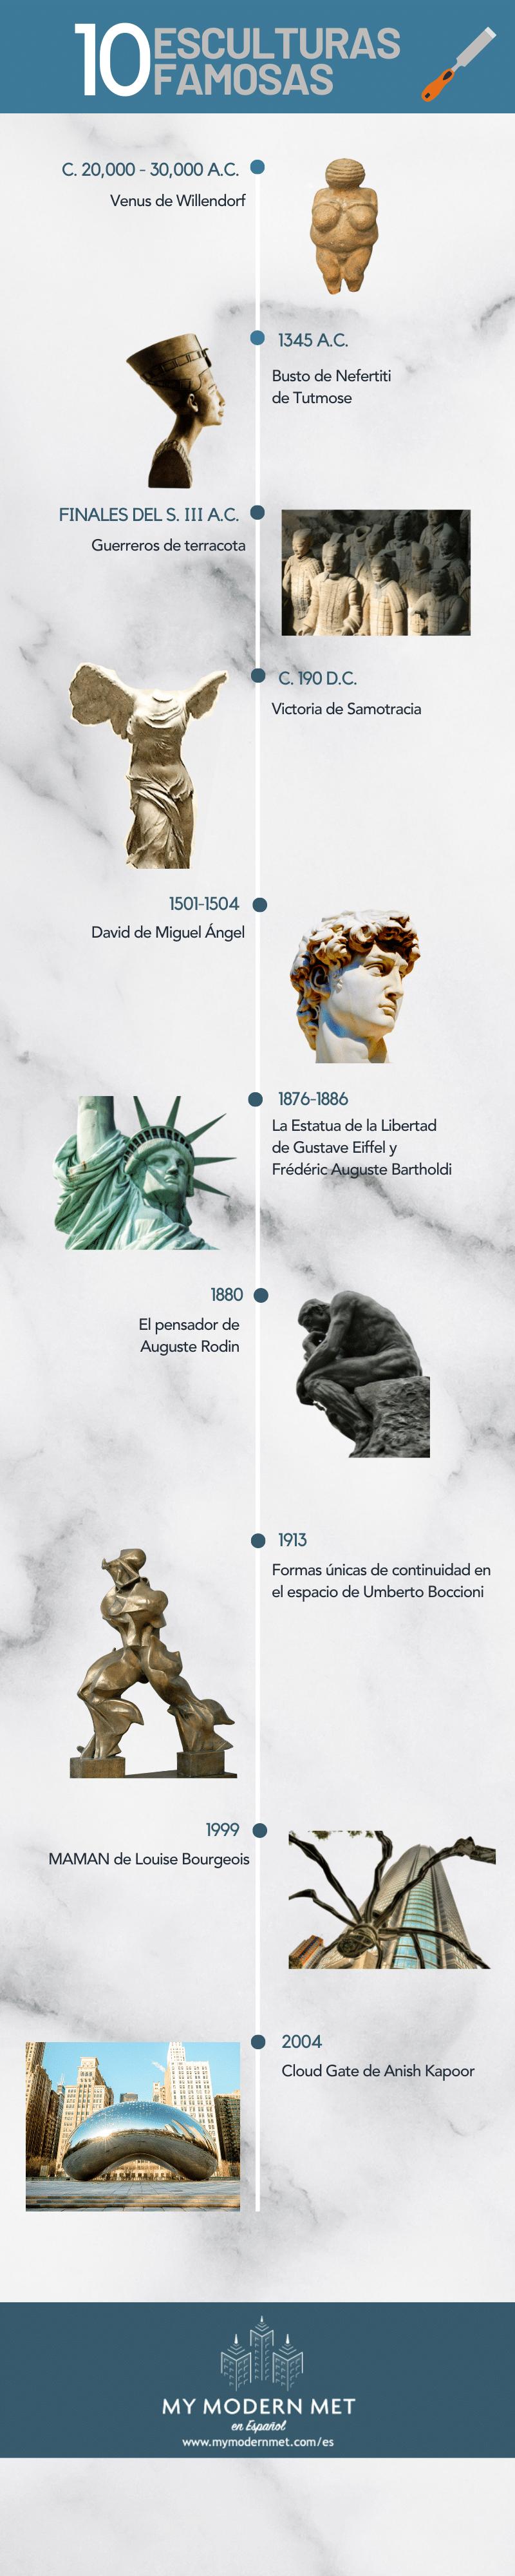 Esculturas famosas de la historia